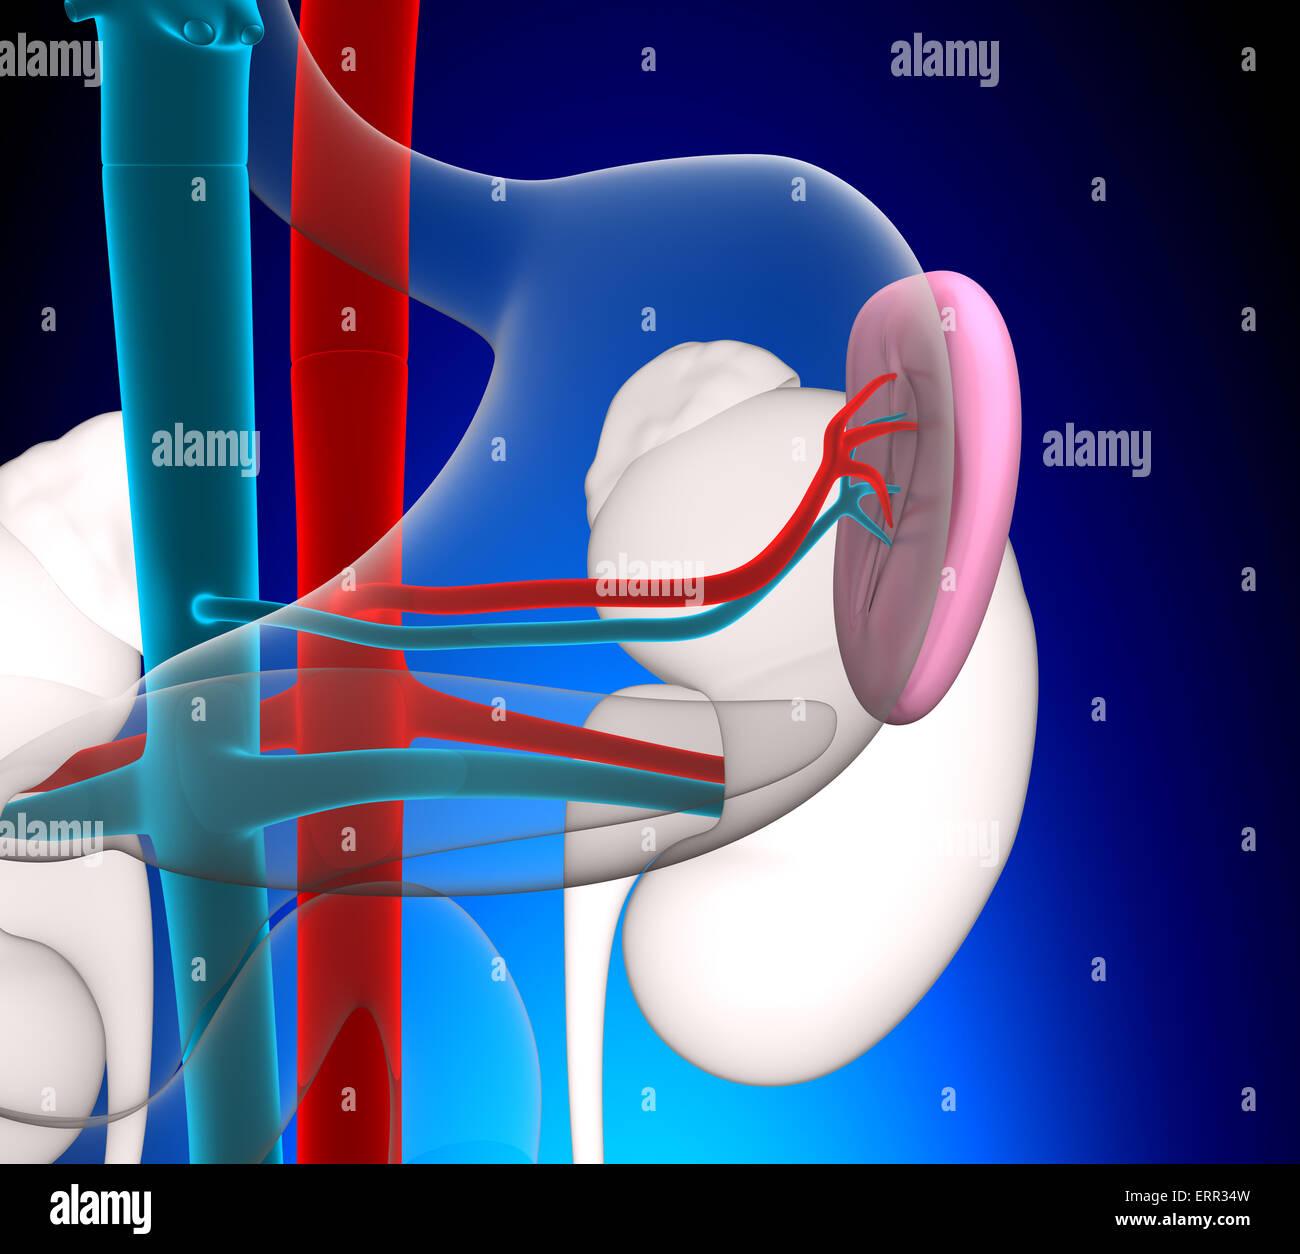 Human Body Anatomy Diagram Stock Photos Amp Human Body Anatomy Diagram Stock Images